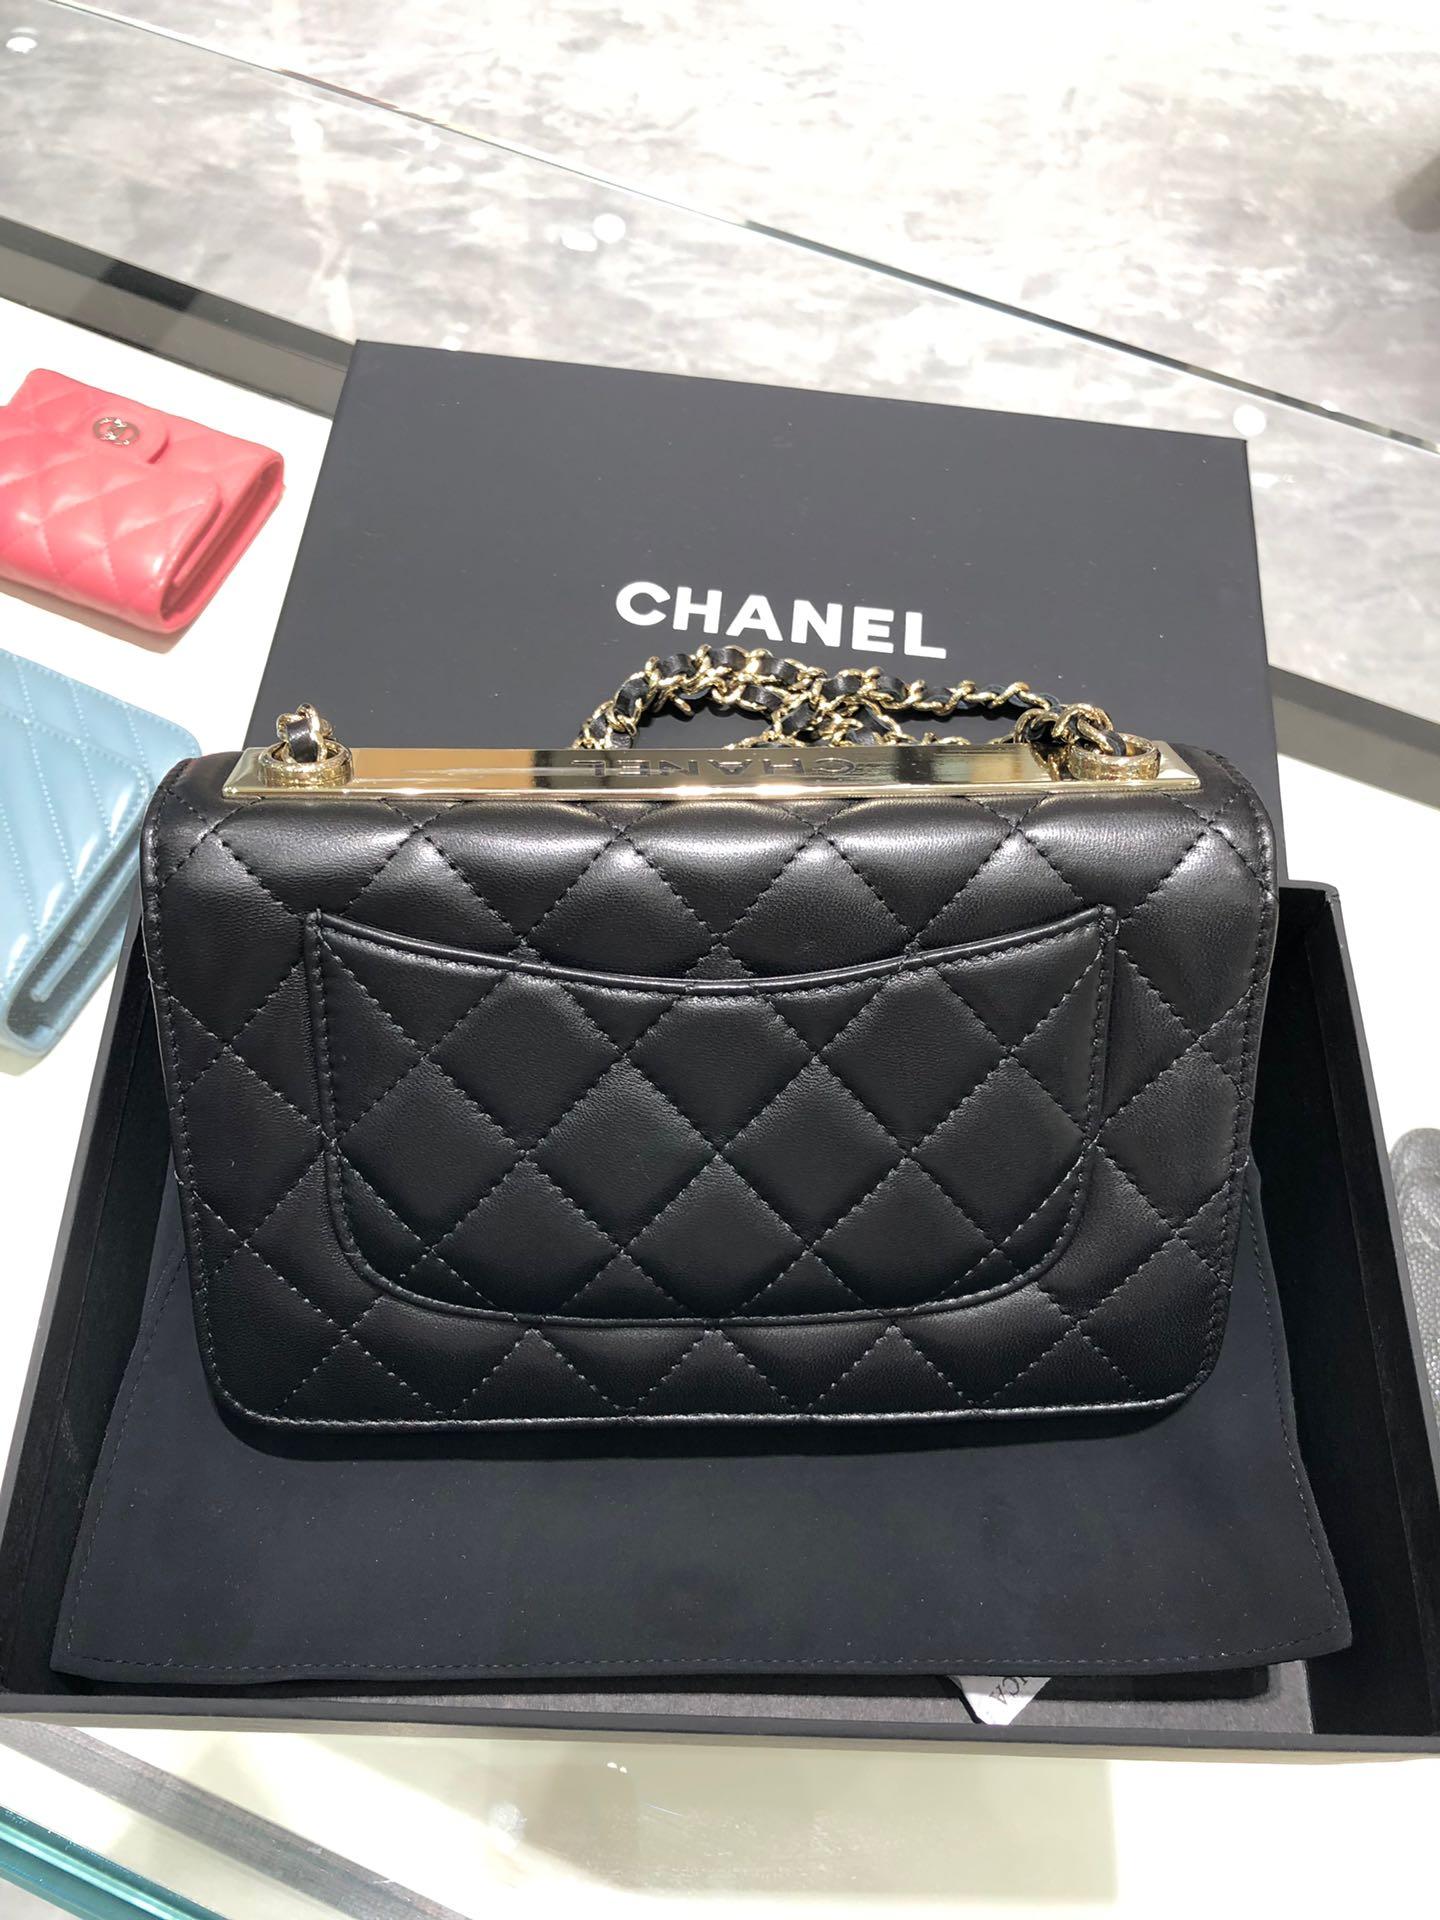 Chanel 香奈儿 WOC~铁片款 19cm 原厂皮小羊皮 黑色 香槟金